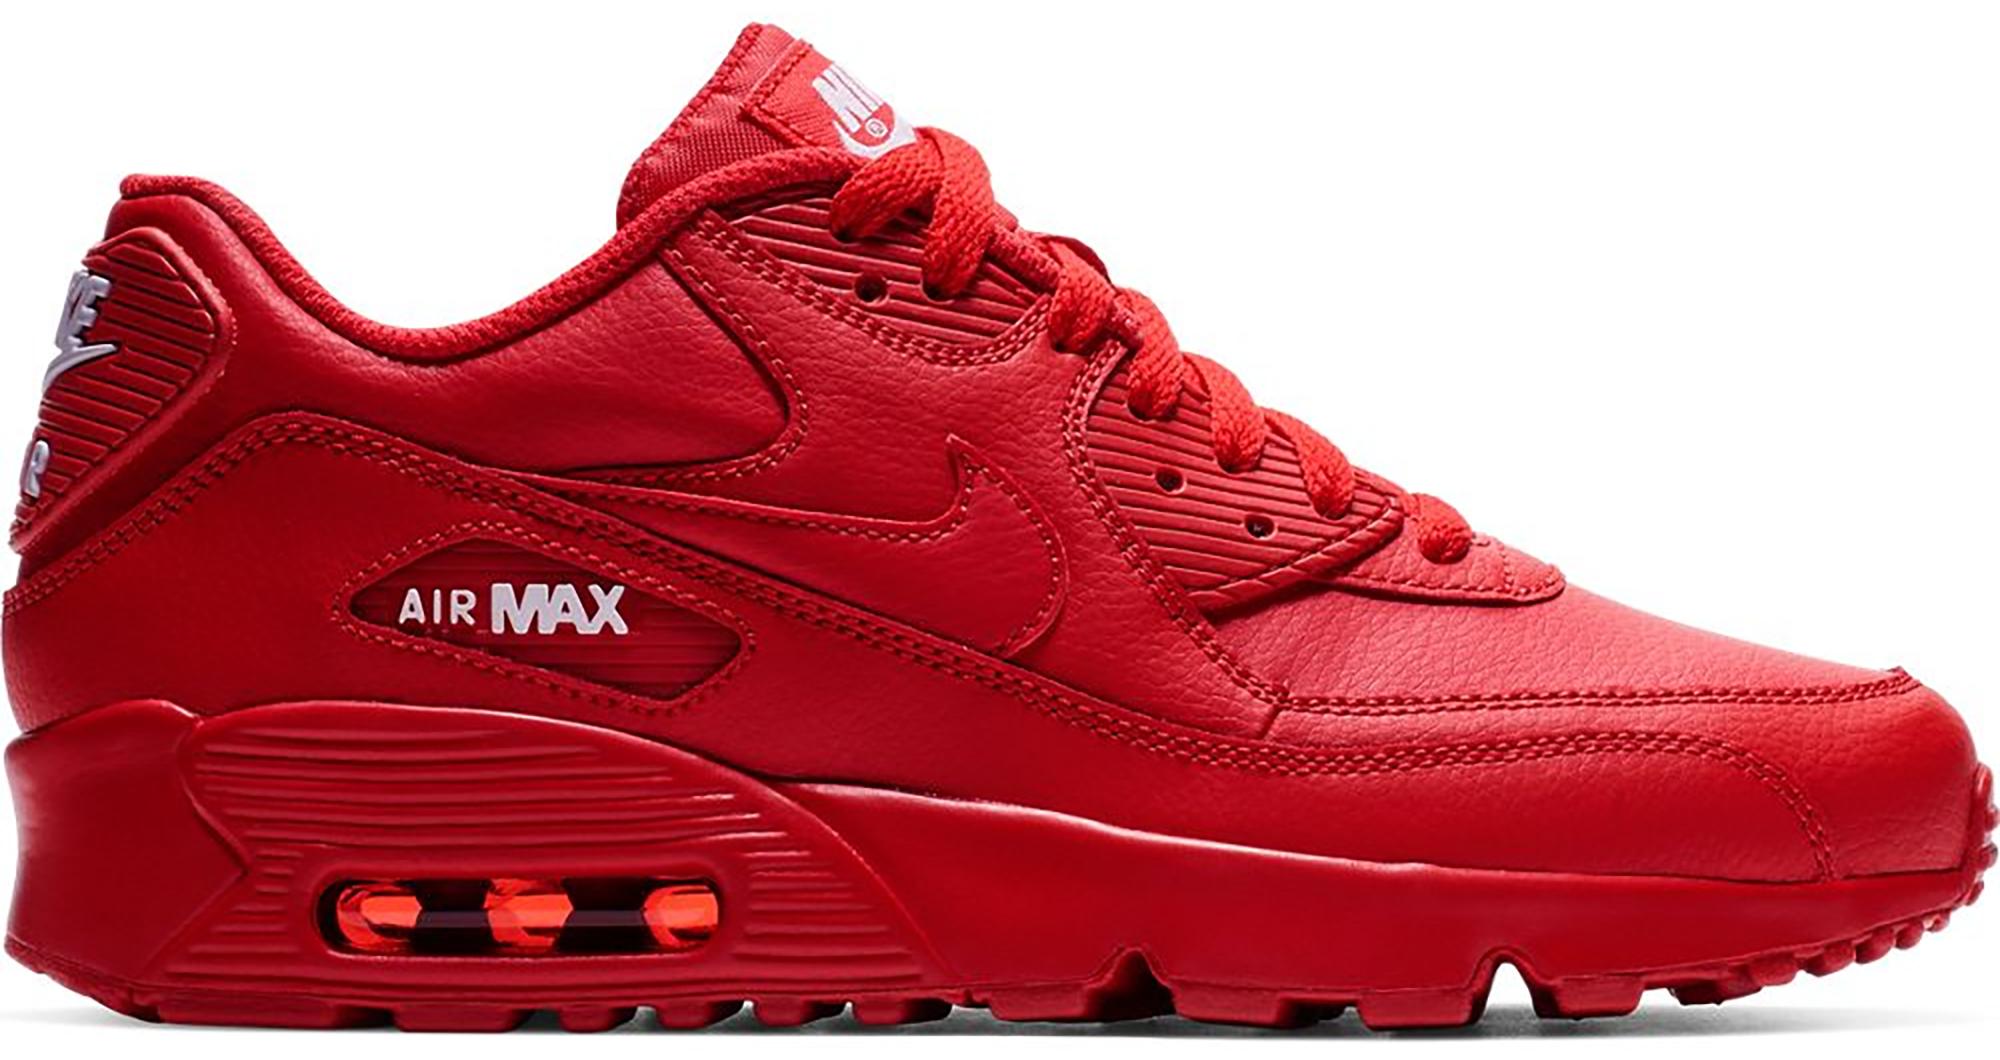 Nike Air Max 90 University Red (GS